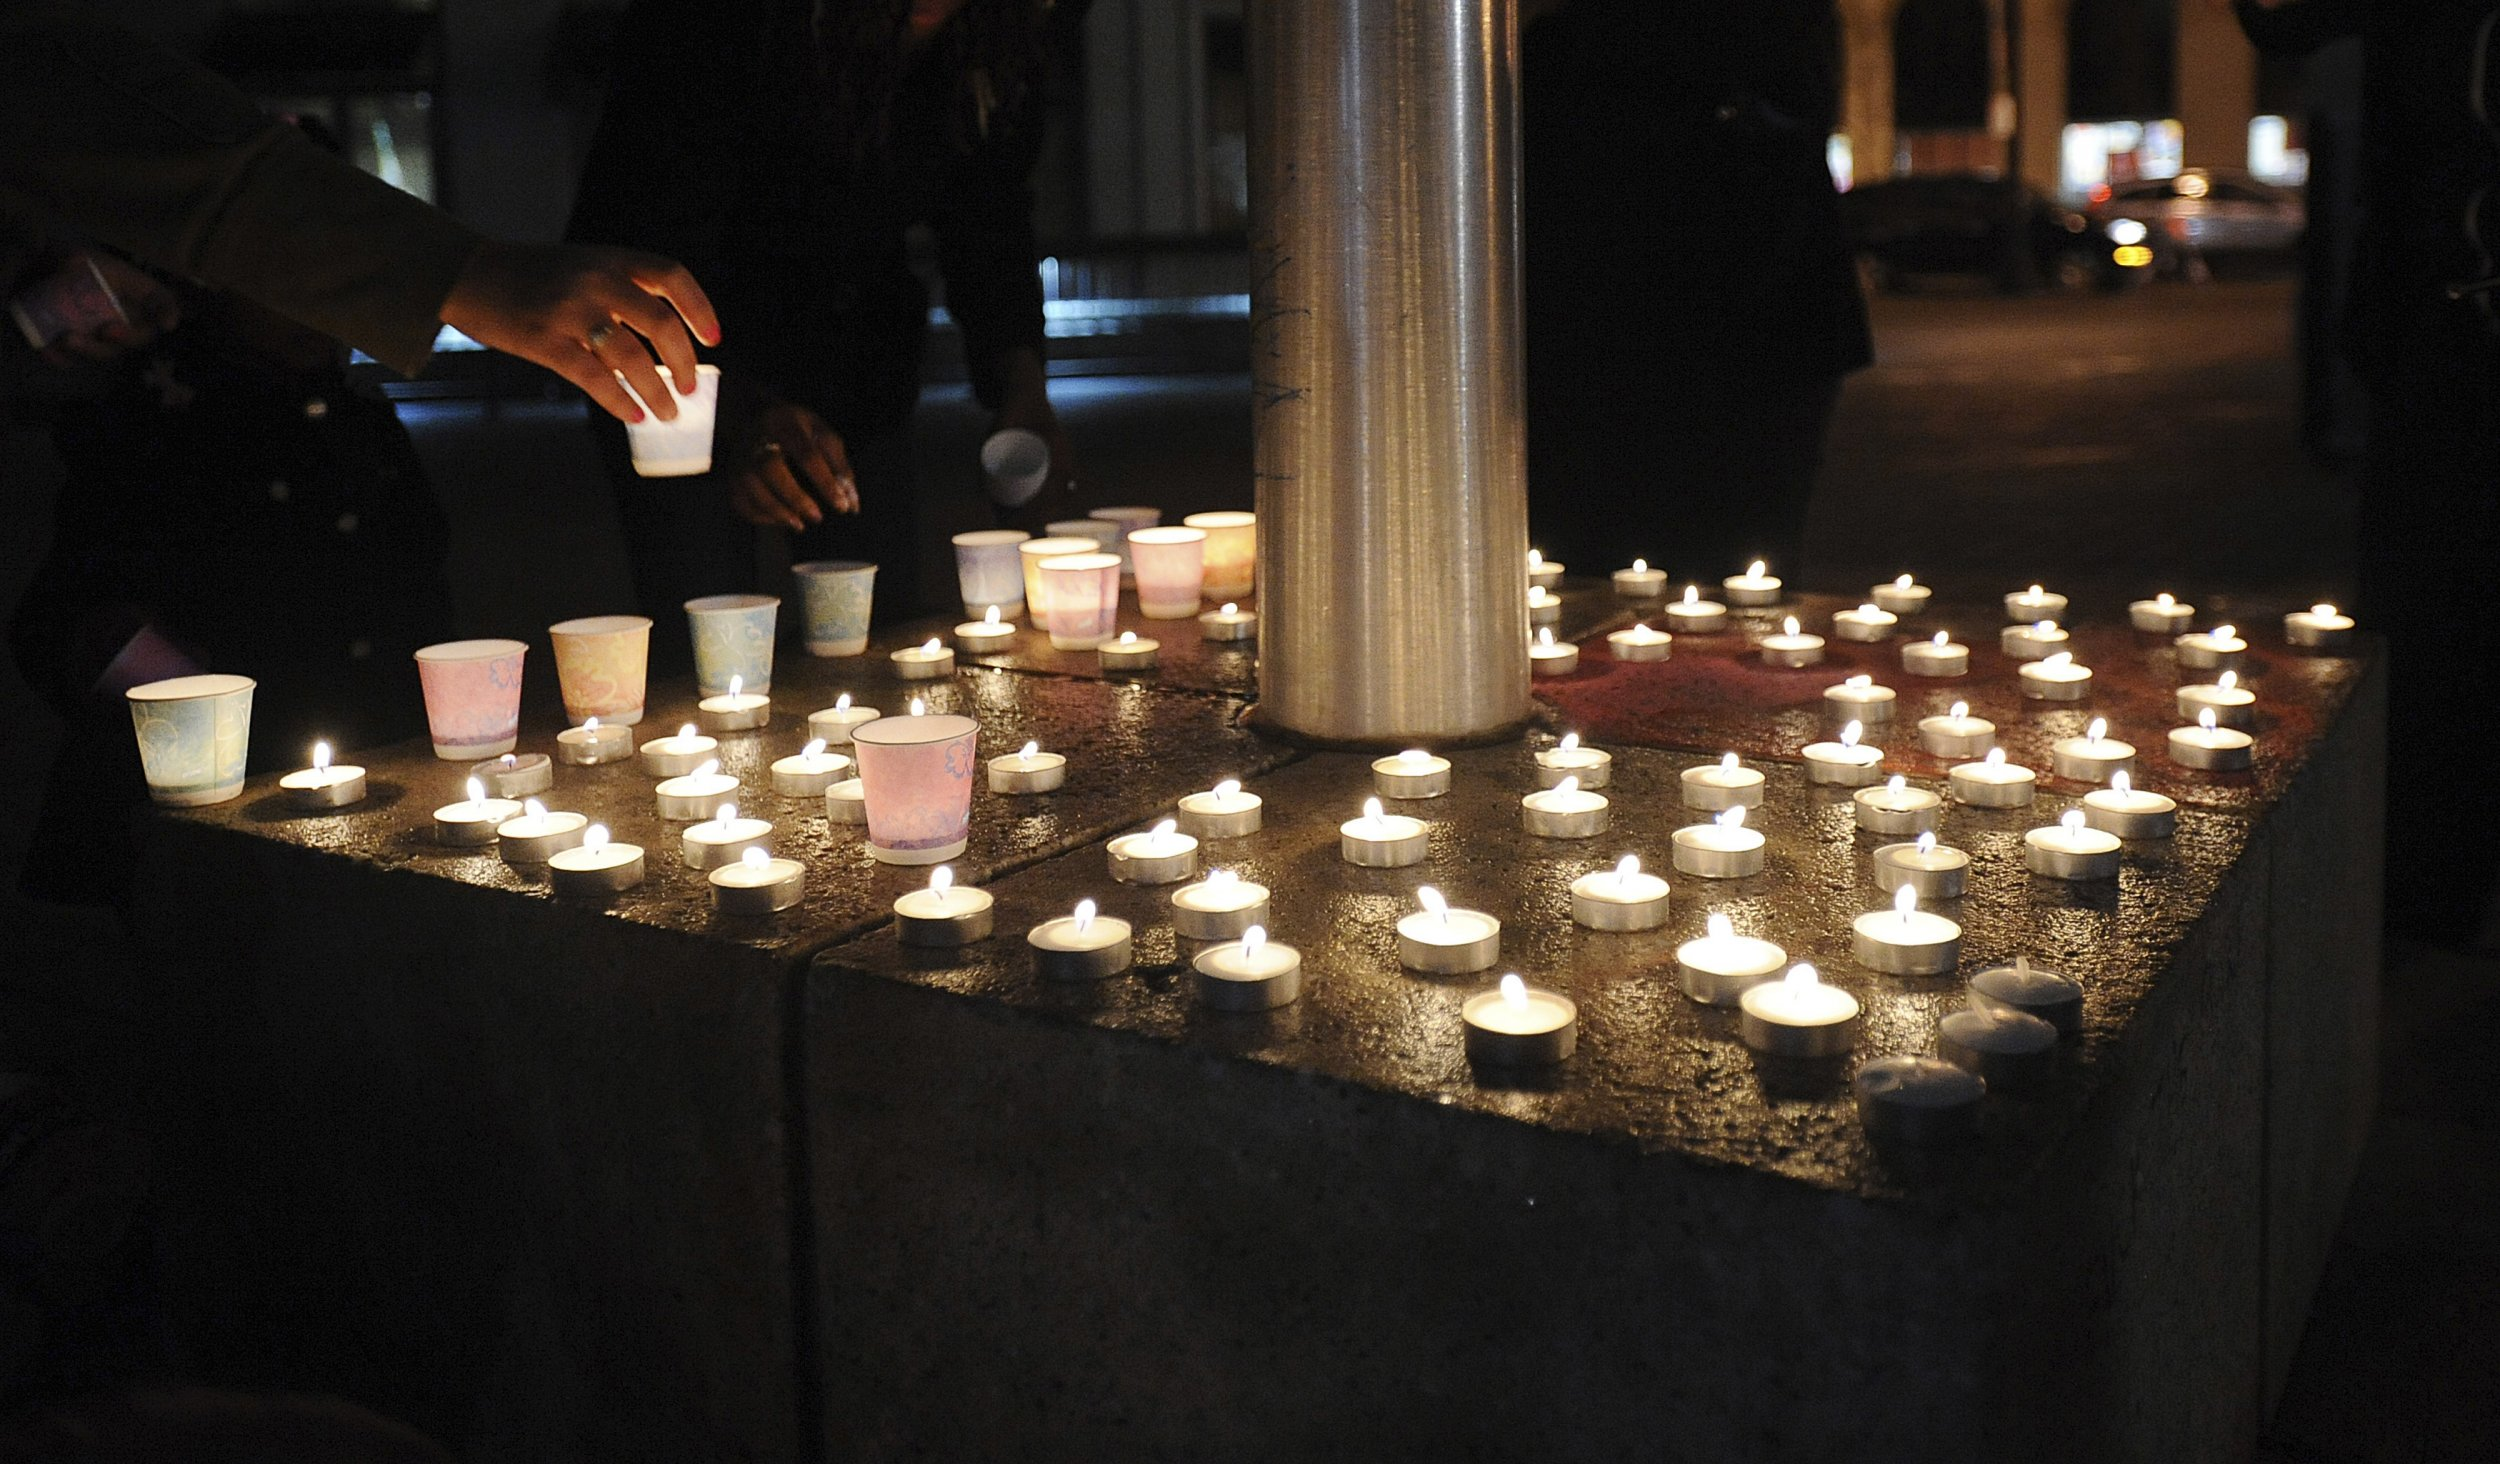 america's history of mass shootings